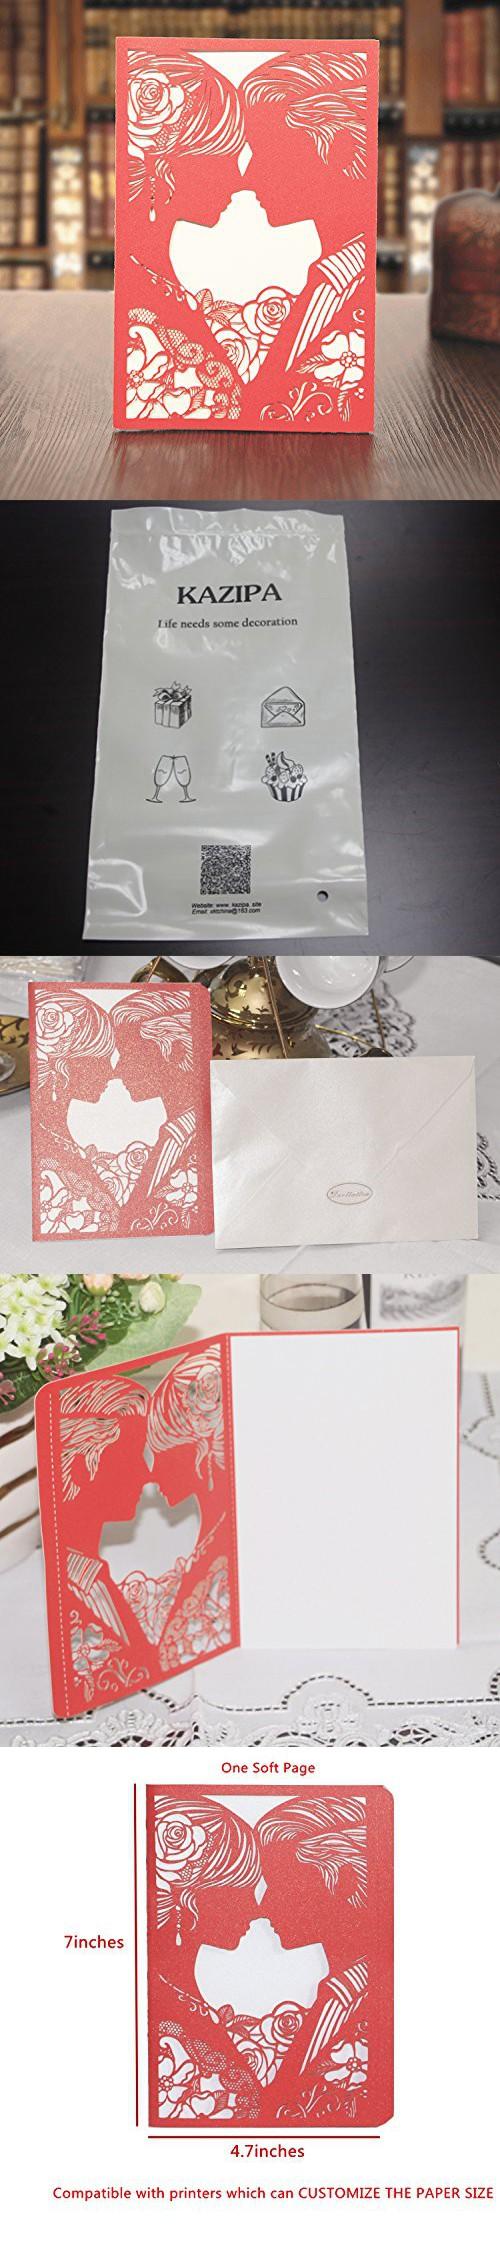 Kazipa 25 Pack Set Laser Cut Invitation Cards Lace Invitation Kit